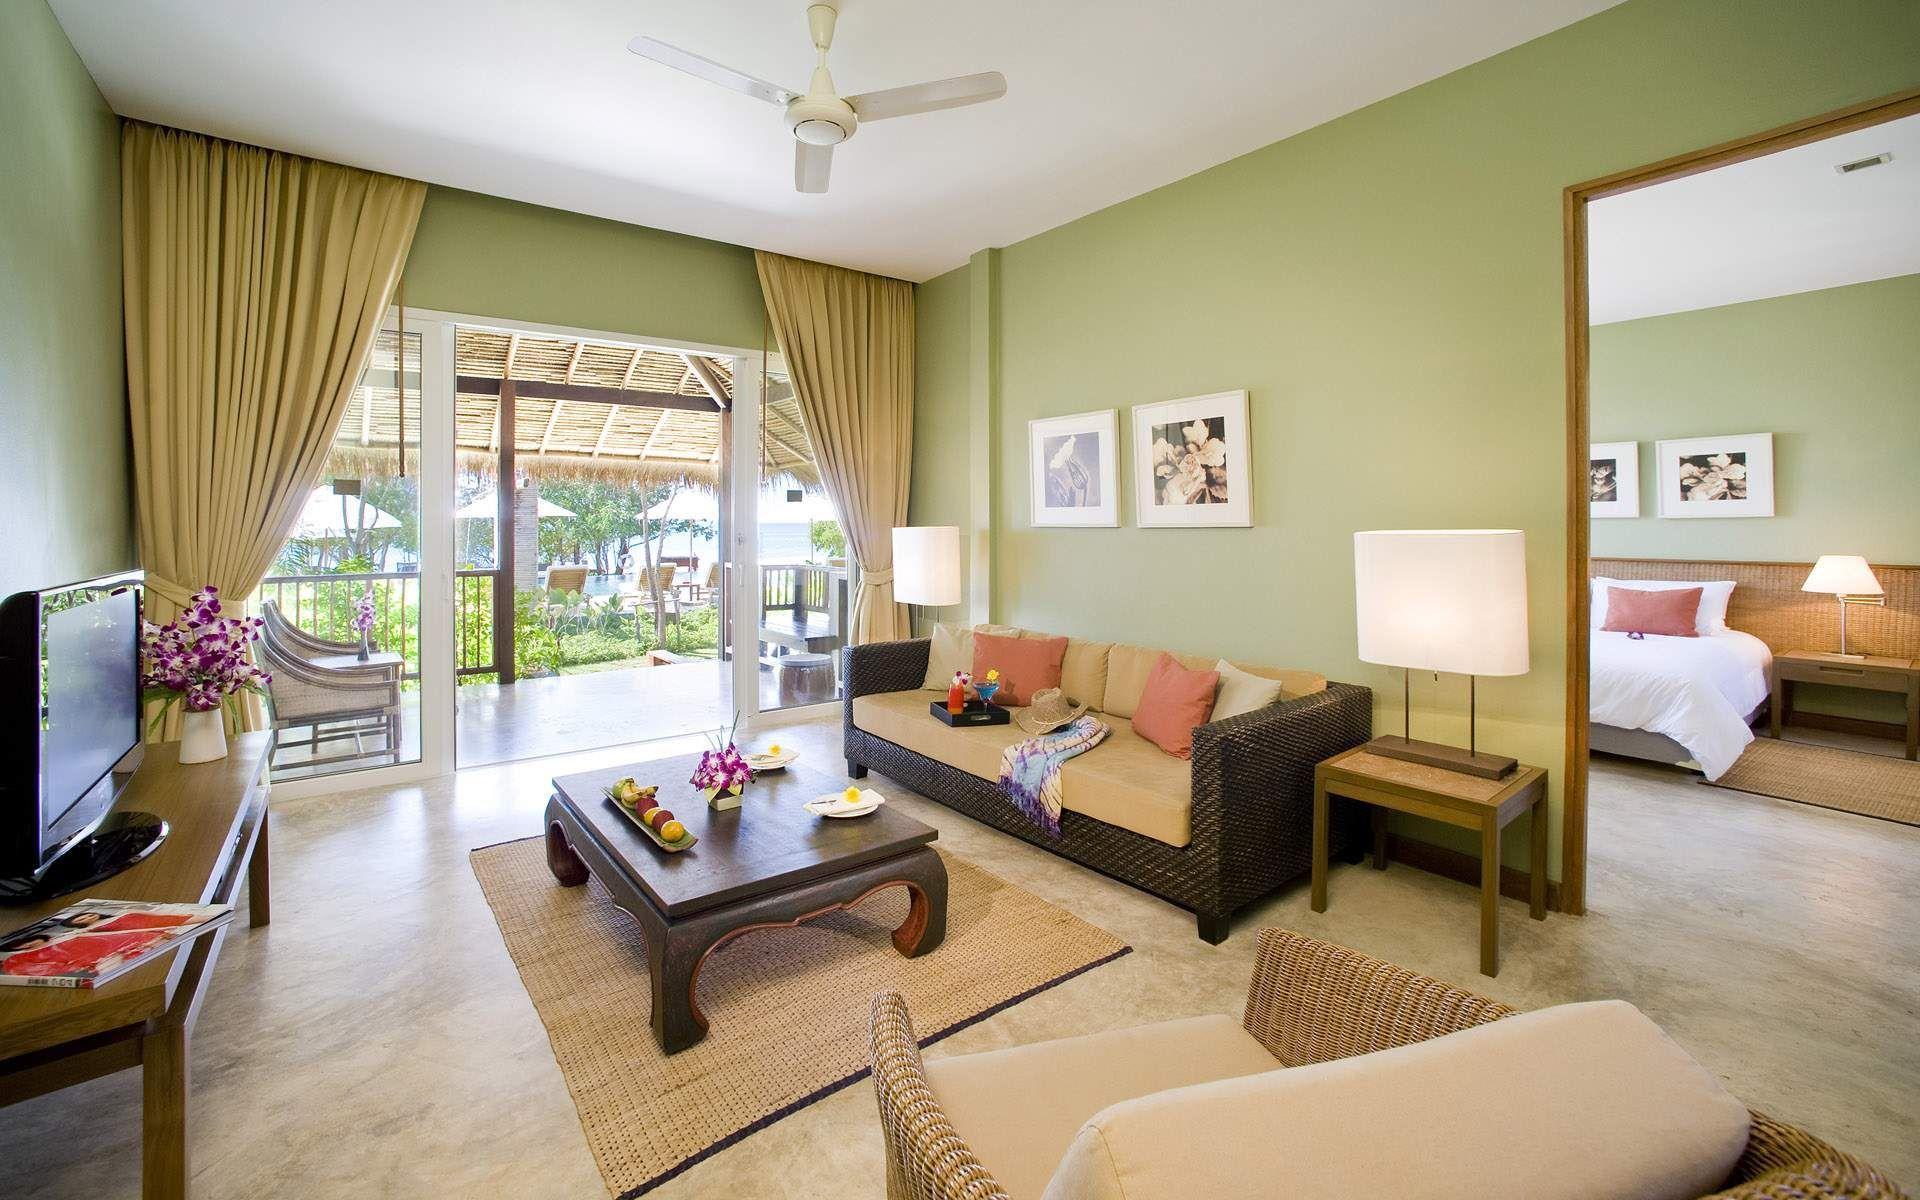 Green And White Color Scheme Stylish Living Room For Design Captivating Simple Elegant Living Room Design Inspiration